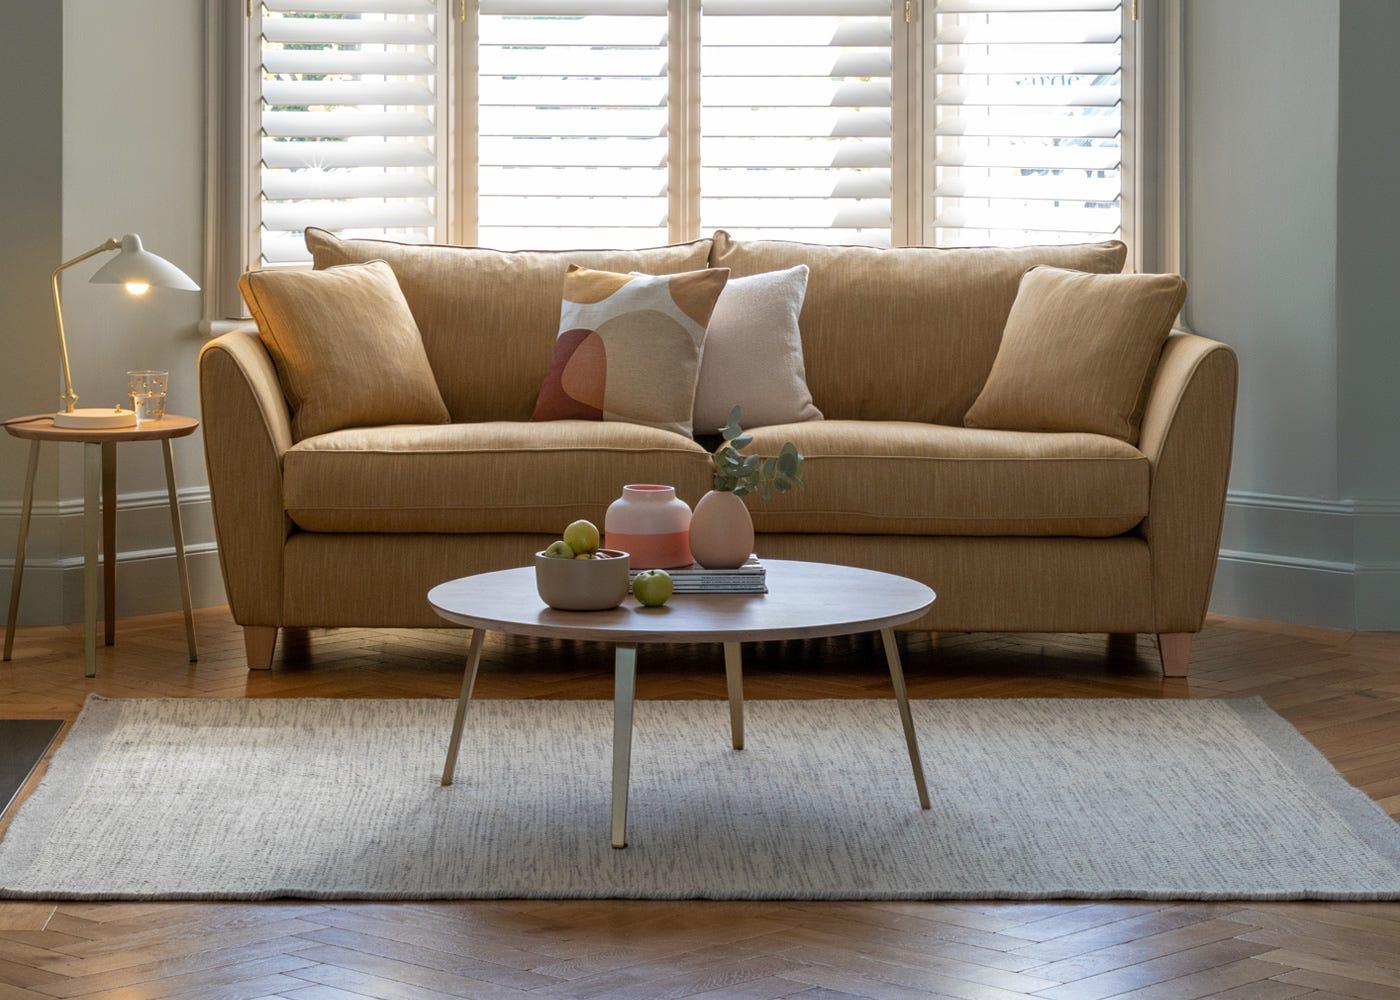 Torino 3 Seater Sofa in Smart Linen Mix Sand